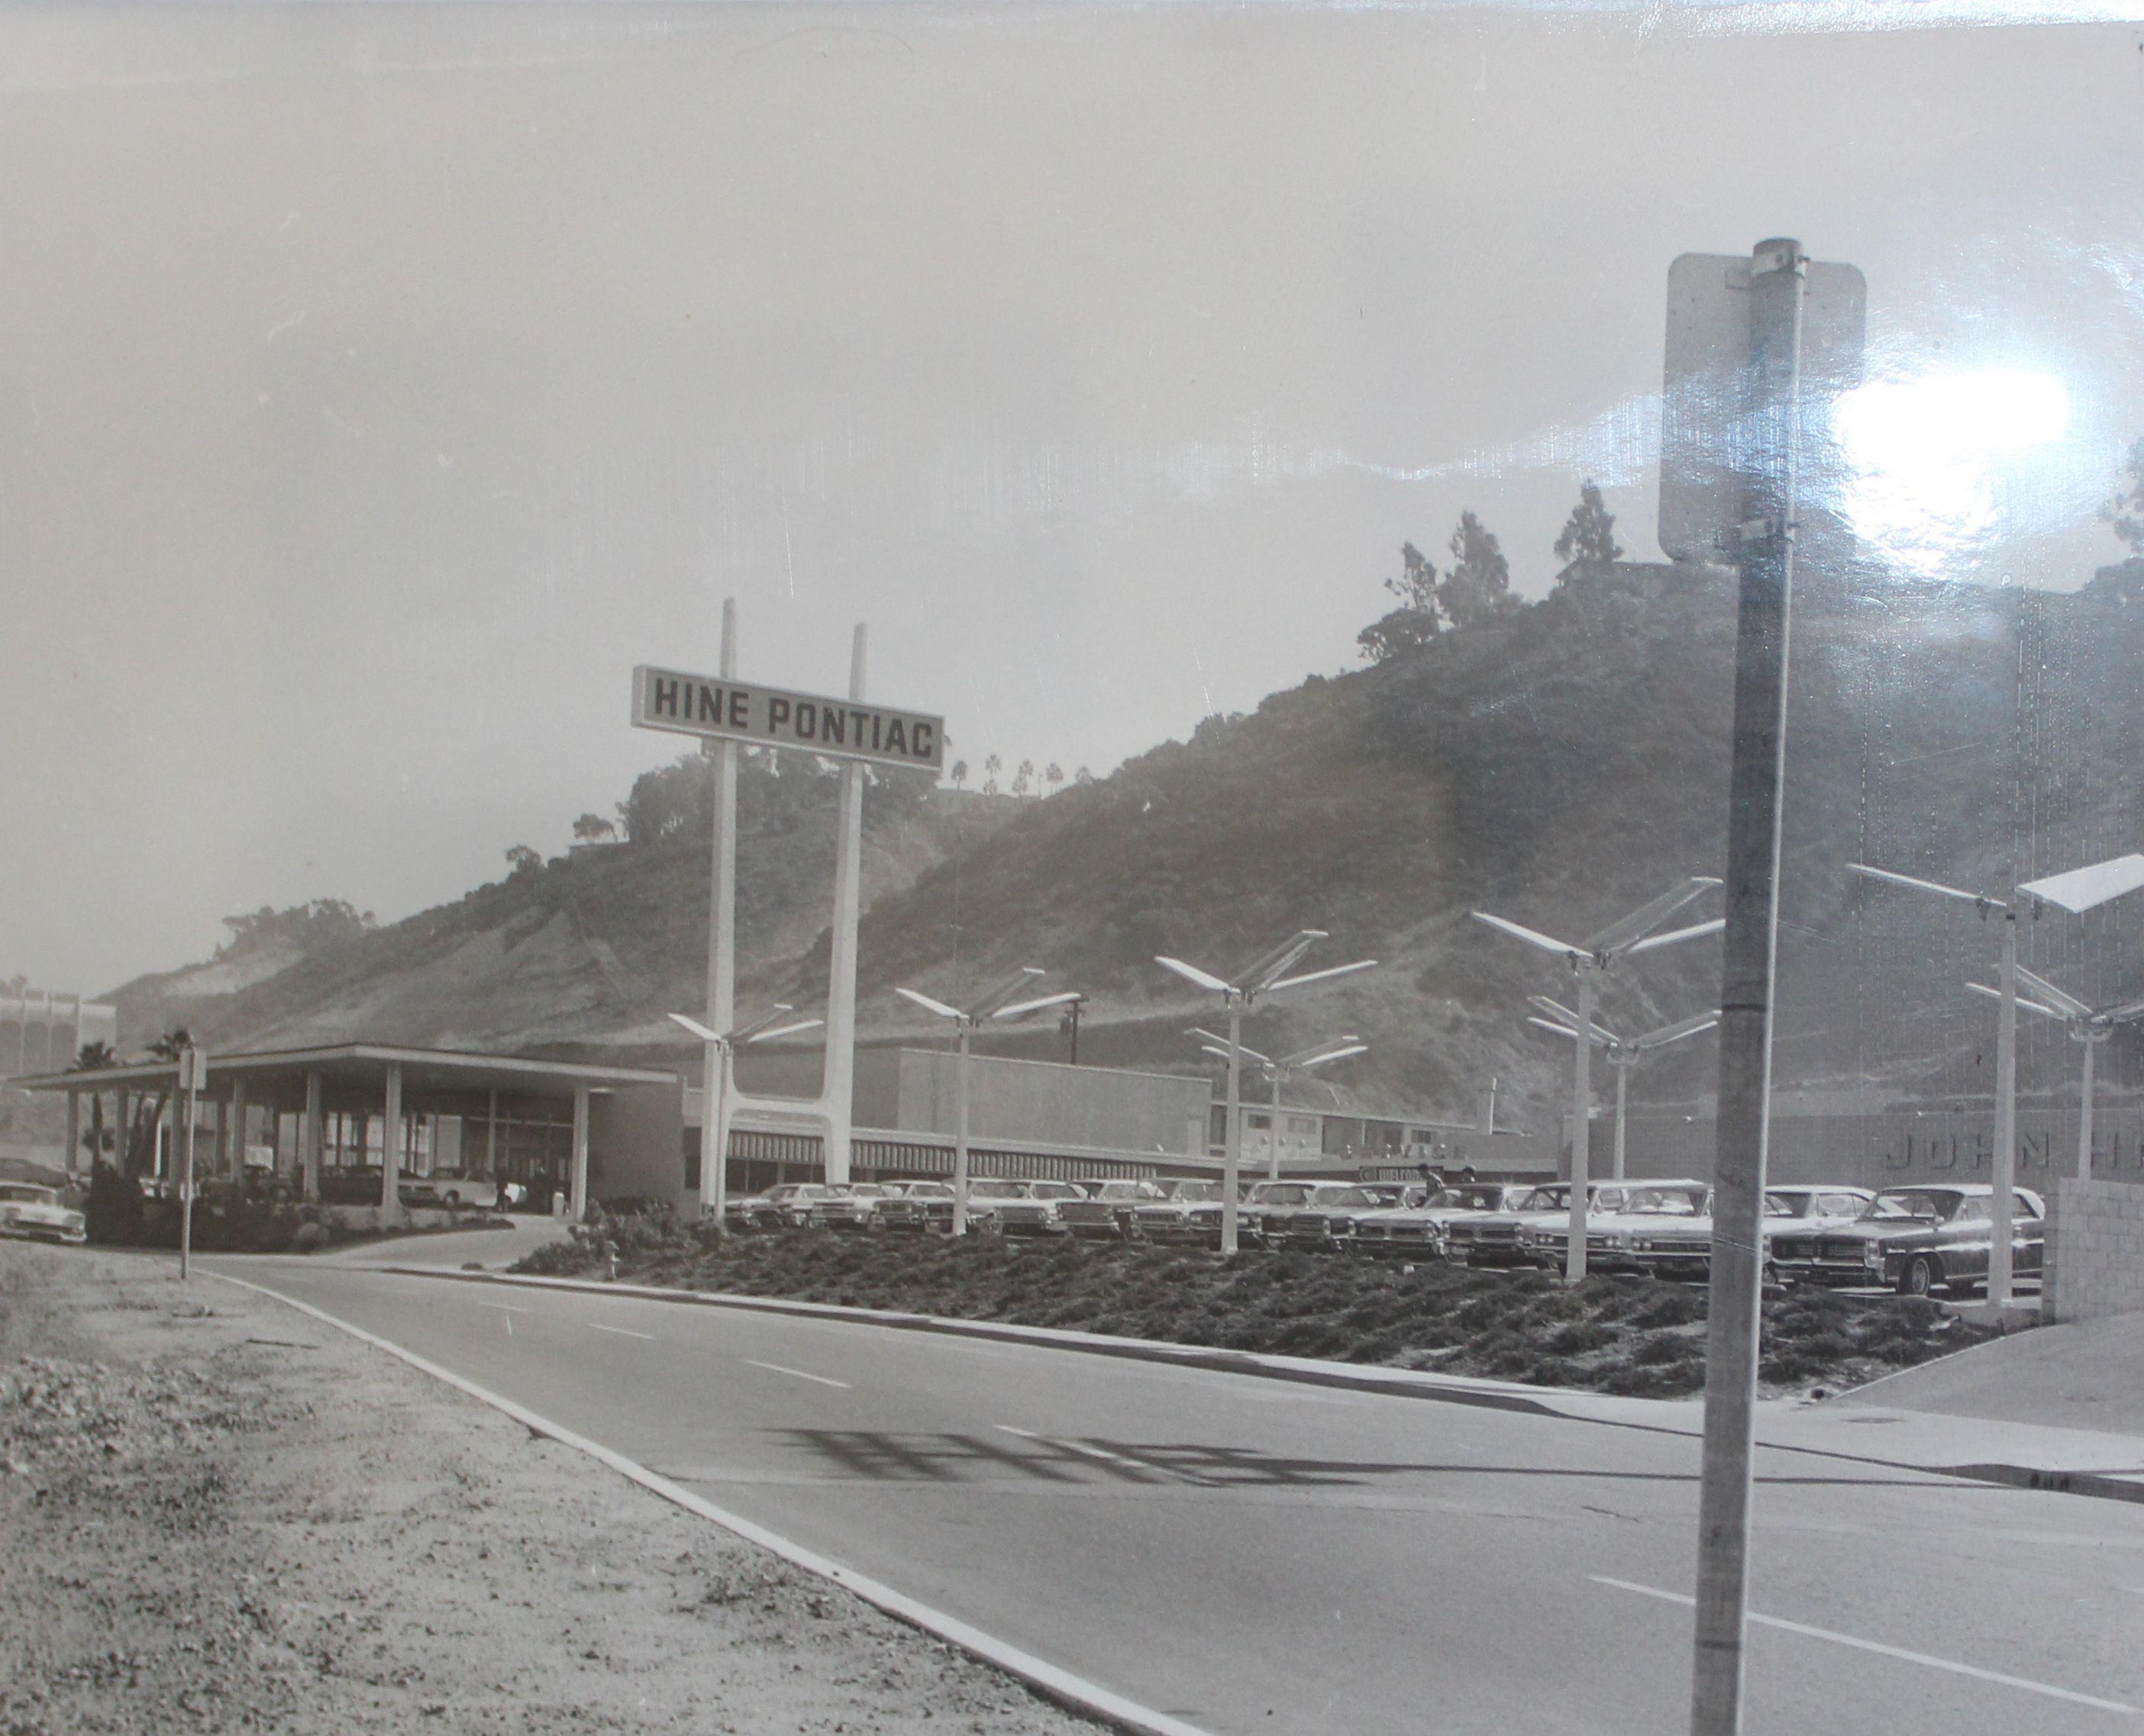 Mazda Dealership San Diego >> John Hine Pontiac 1957 Mission Valley San Diego. #Throwback | Our Dealership in 2019